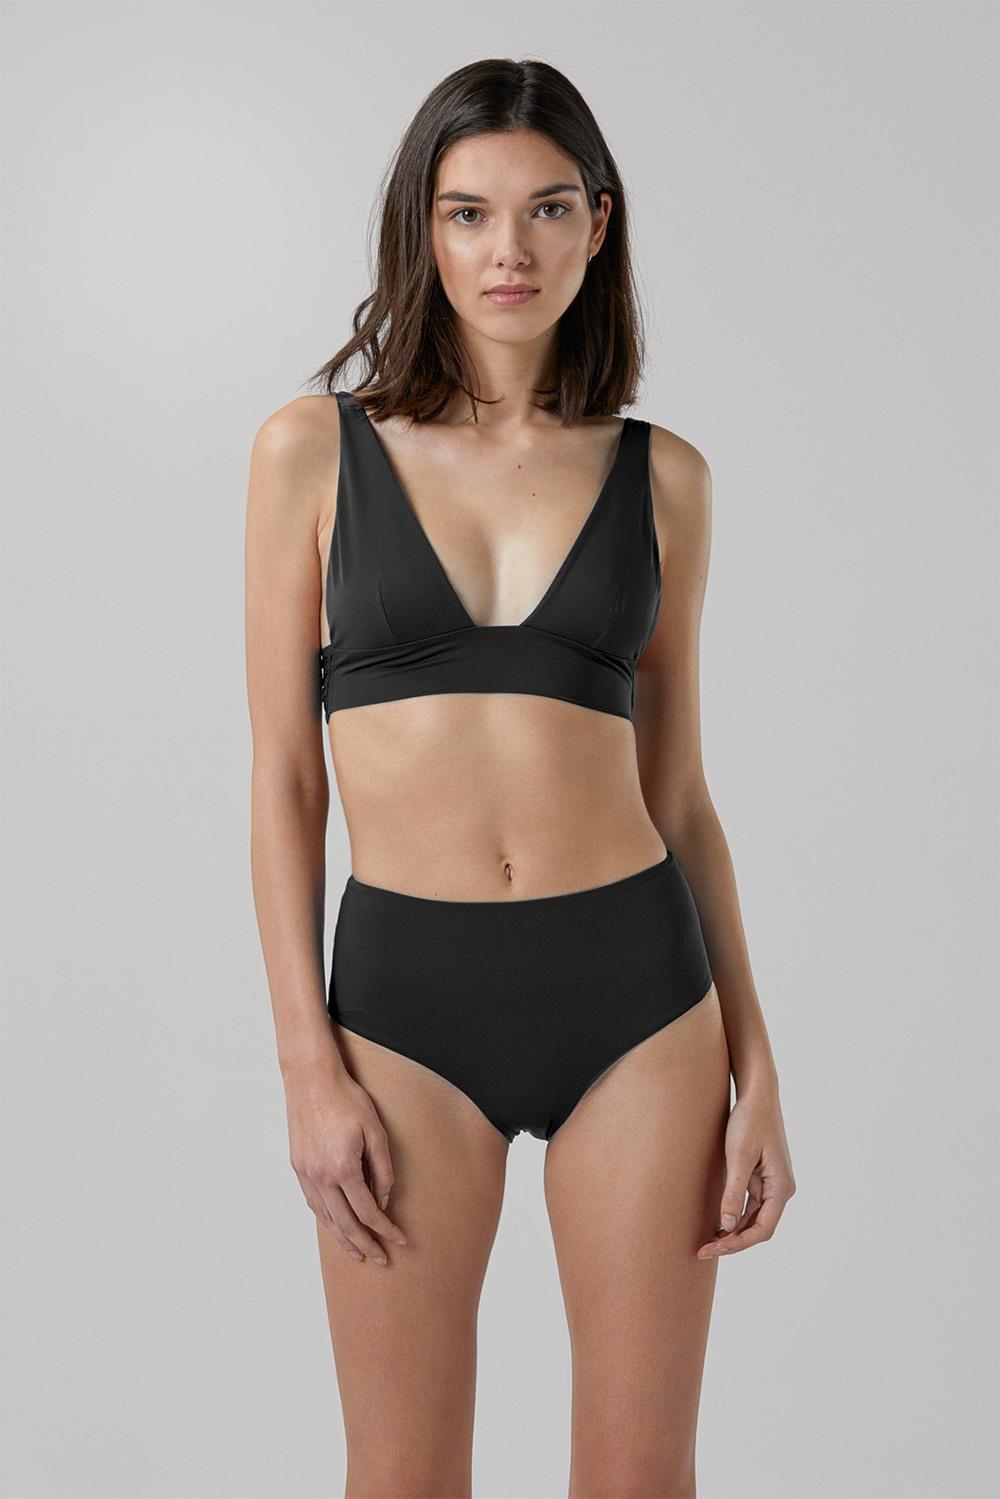 Sustainable Luxury Swimwear / Ropa de baño sostenible, eco bikini / bikini ecológico. Kapalai + Farond in black, by NOW_THEN